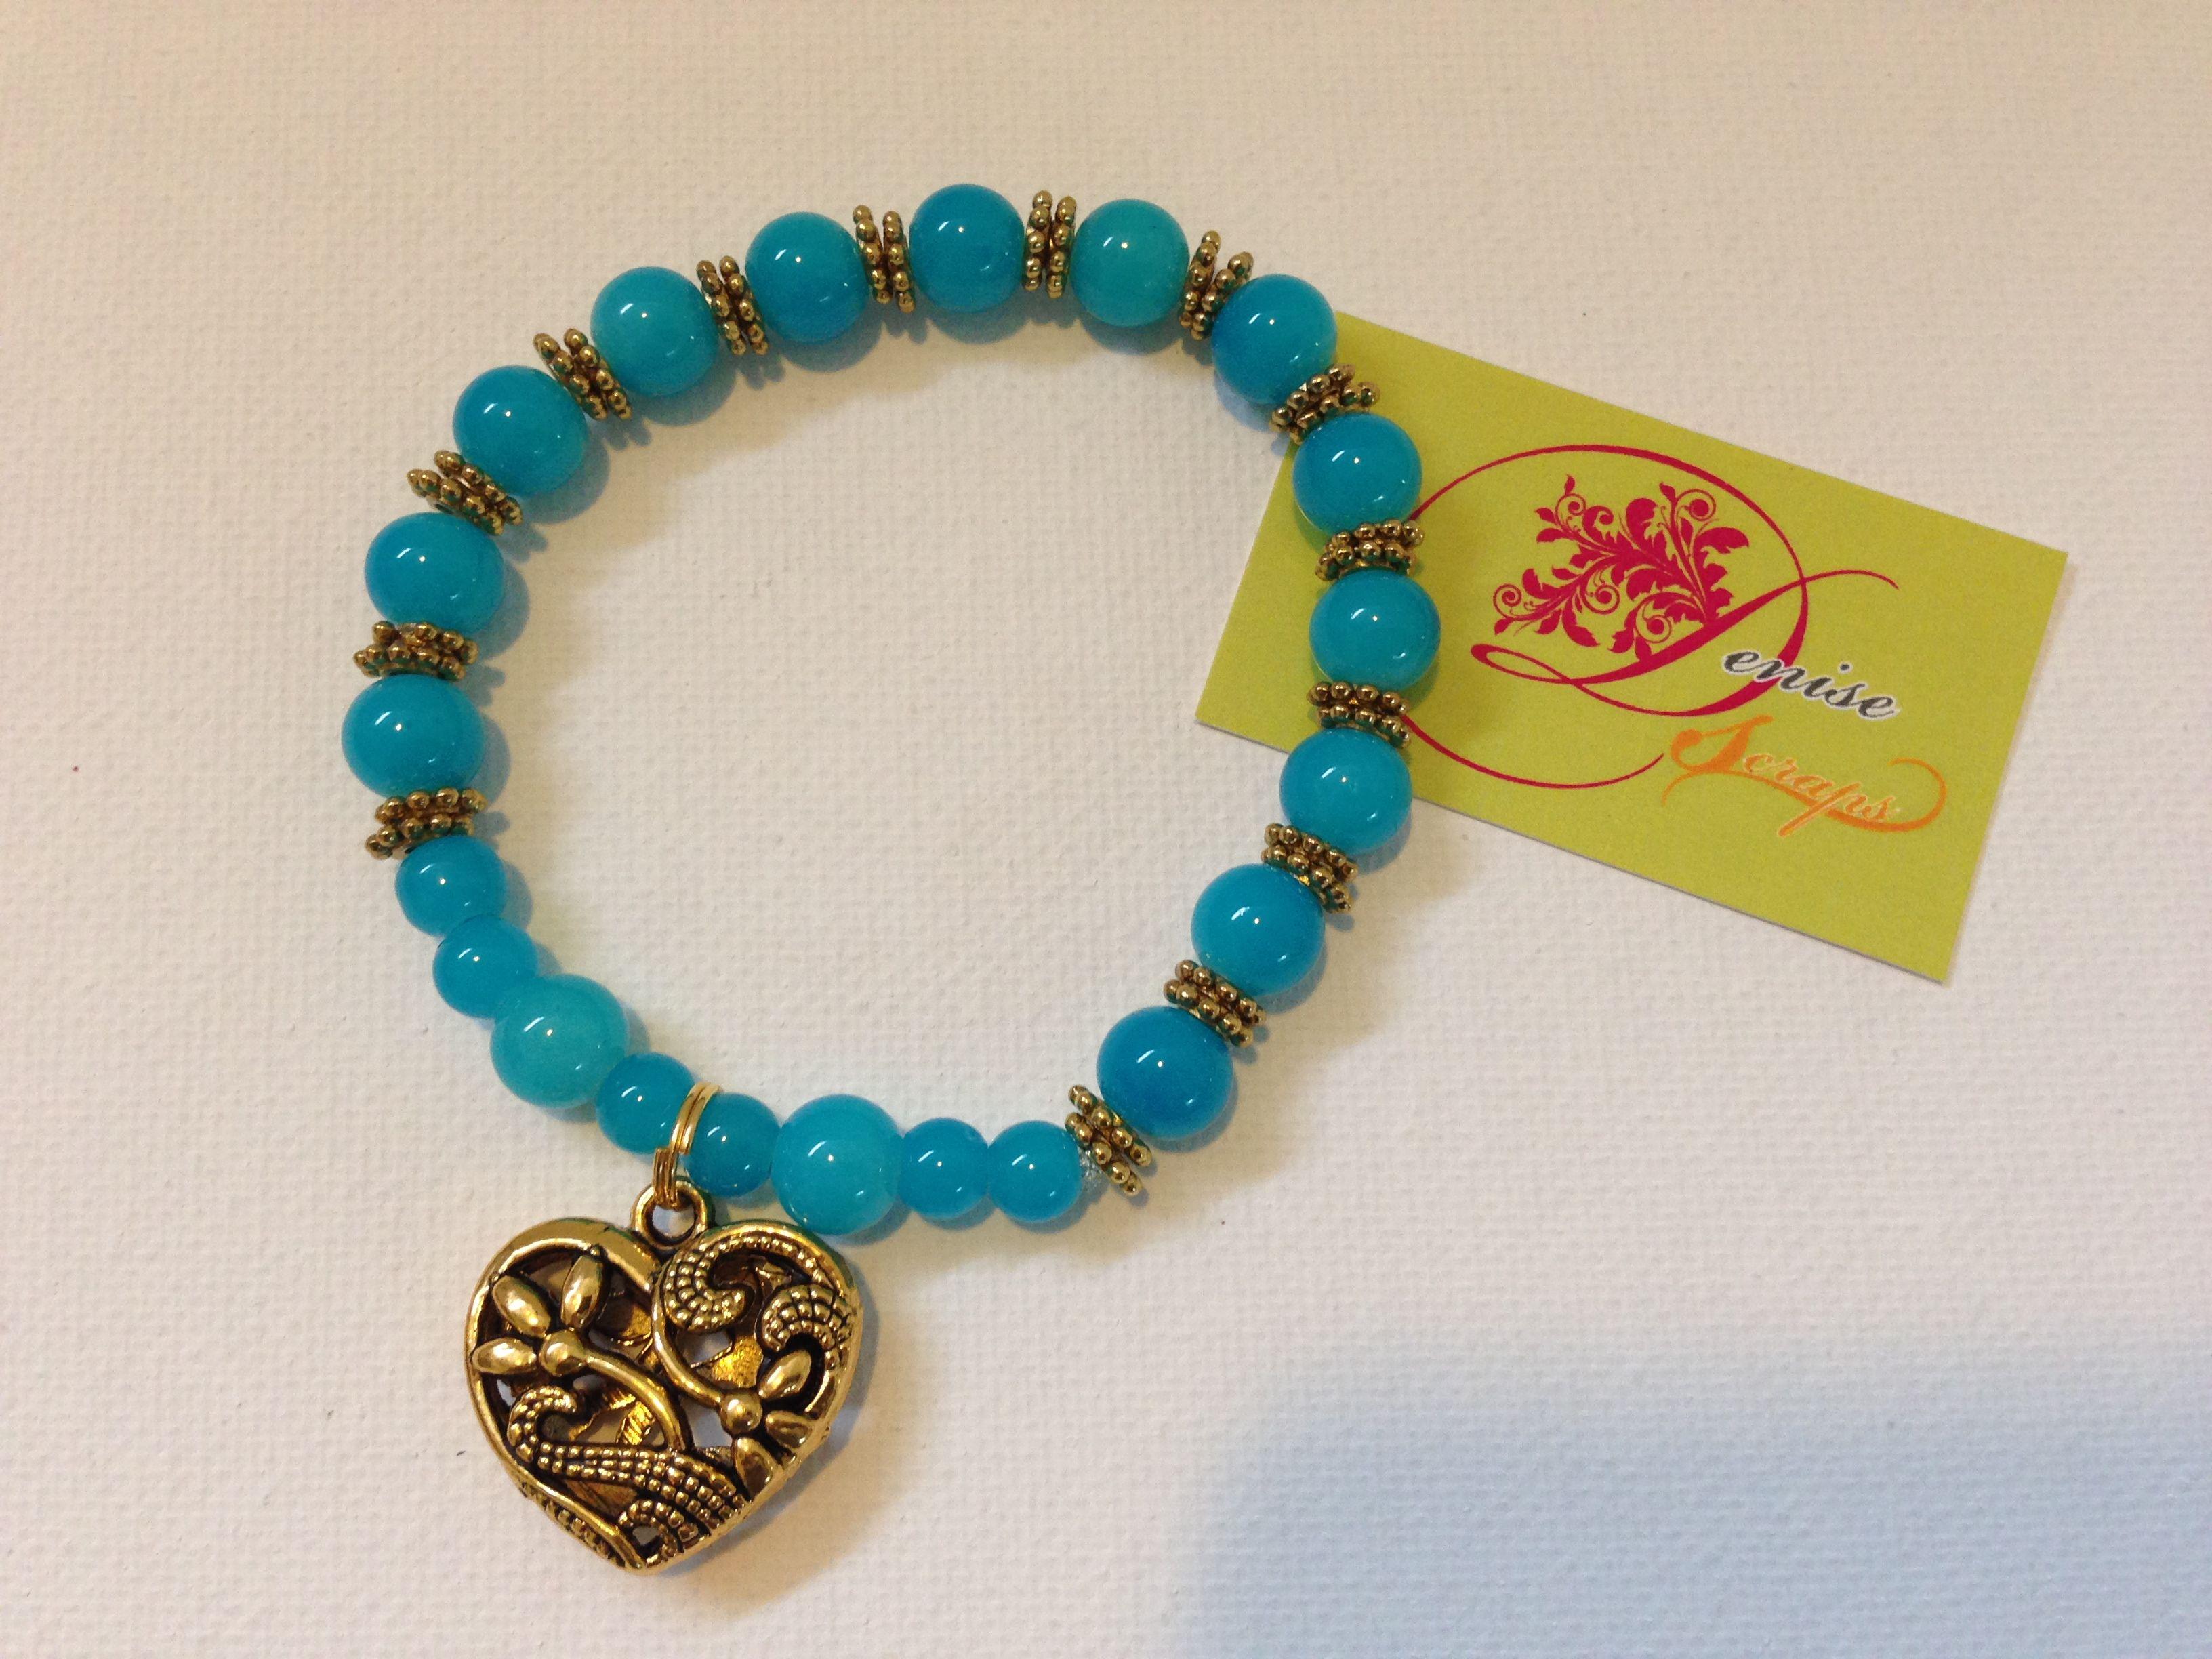 84533cb97a4d photo (67) pulsera de bolitas azul aqua y corazón dorado.